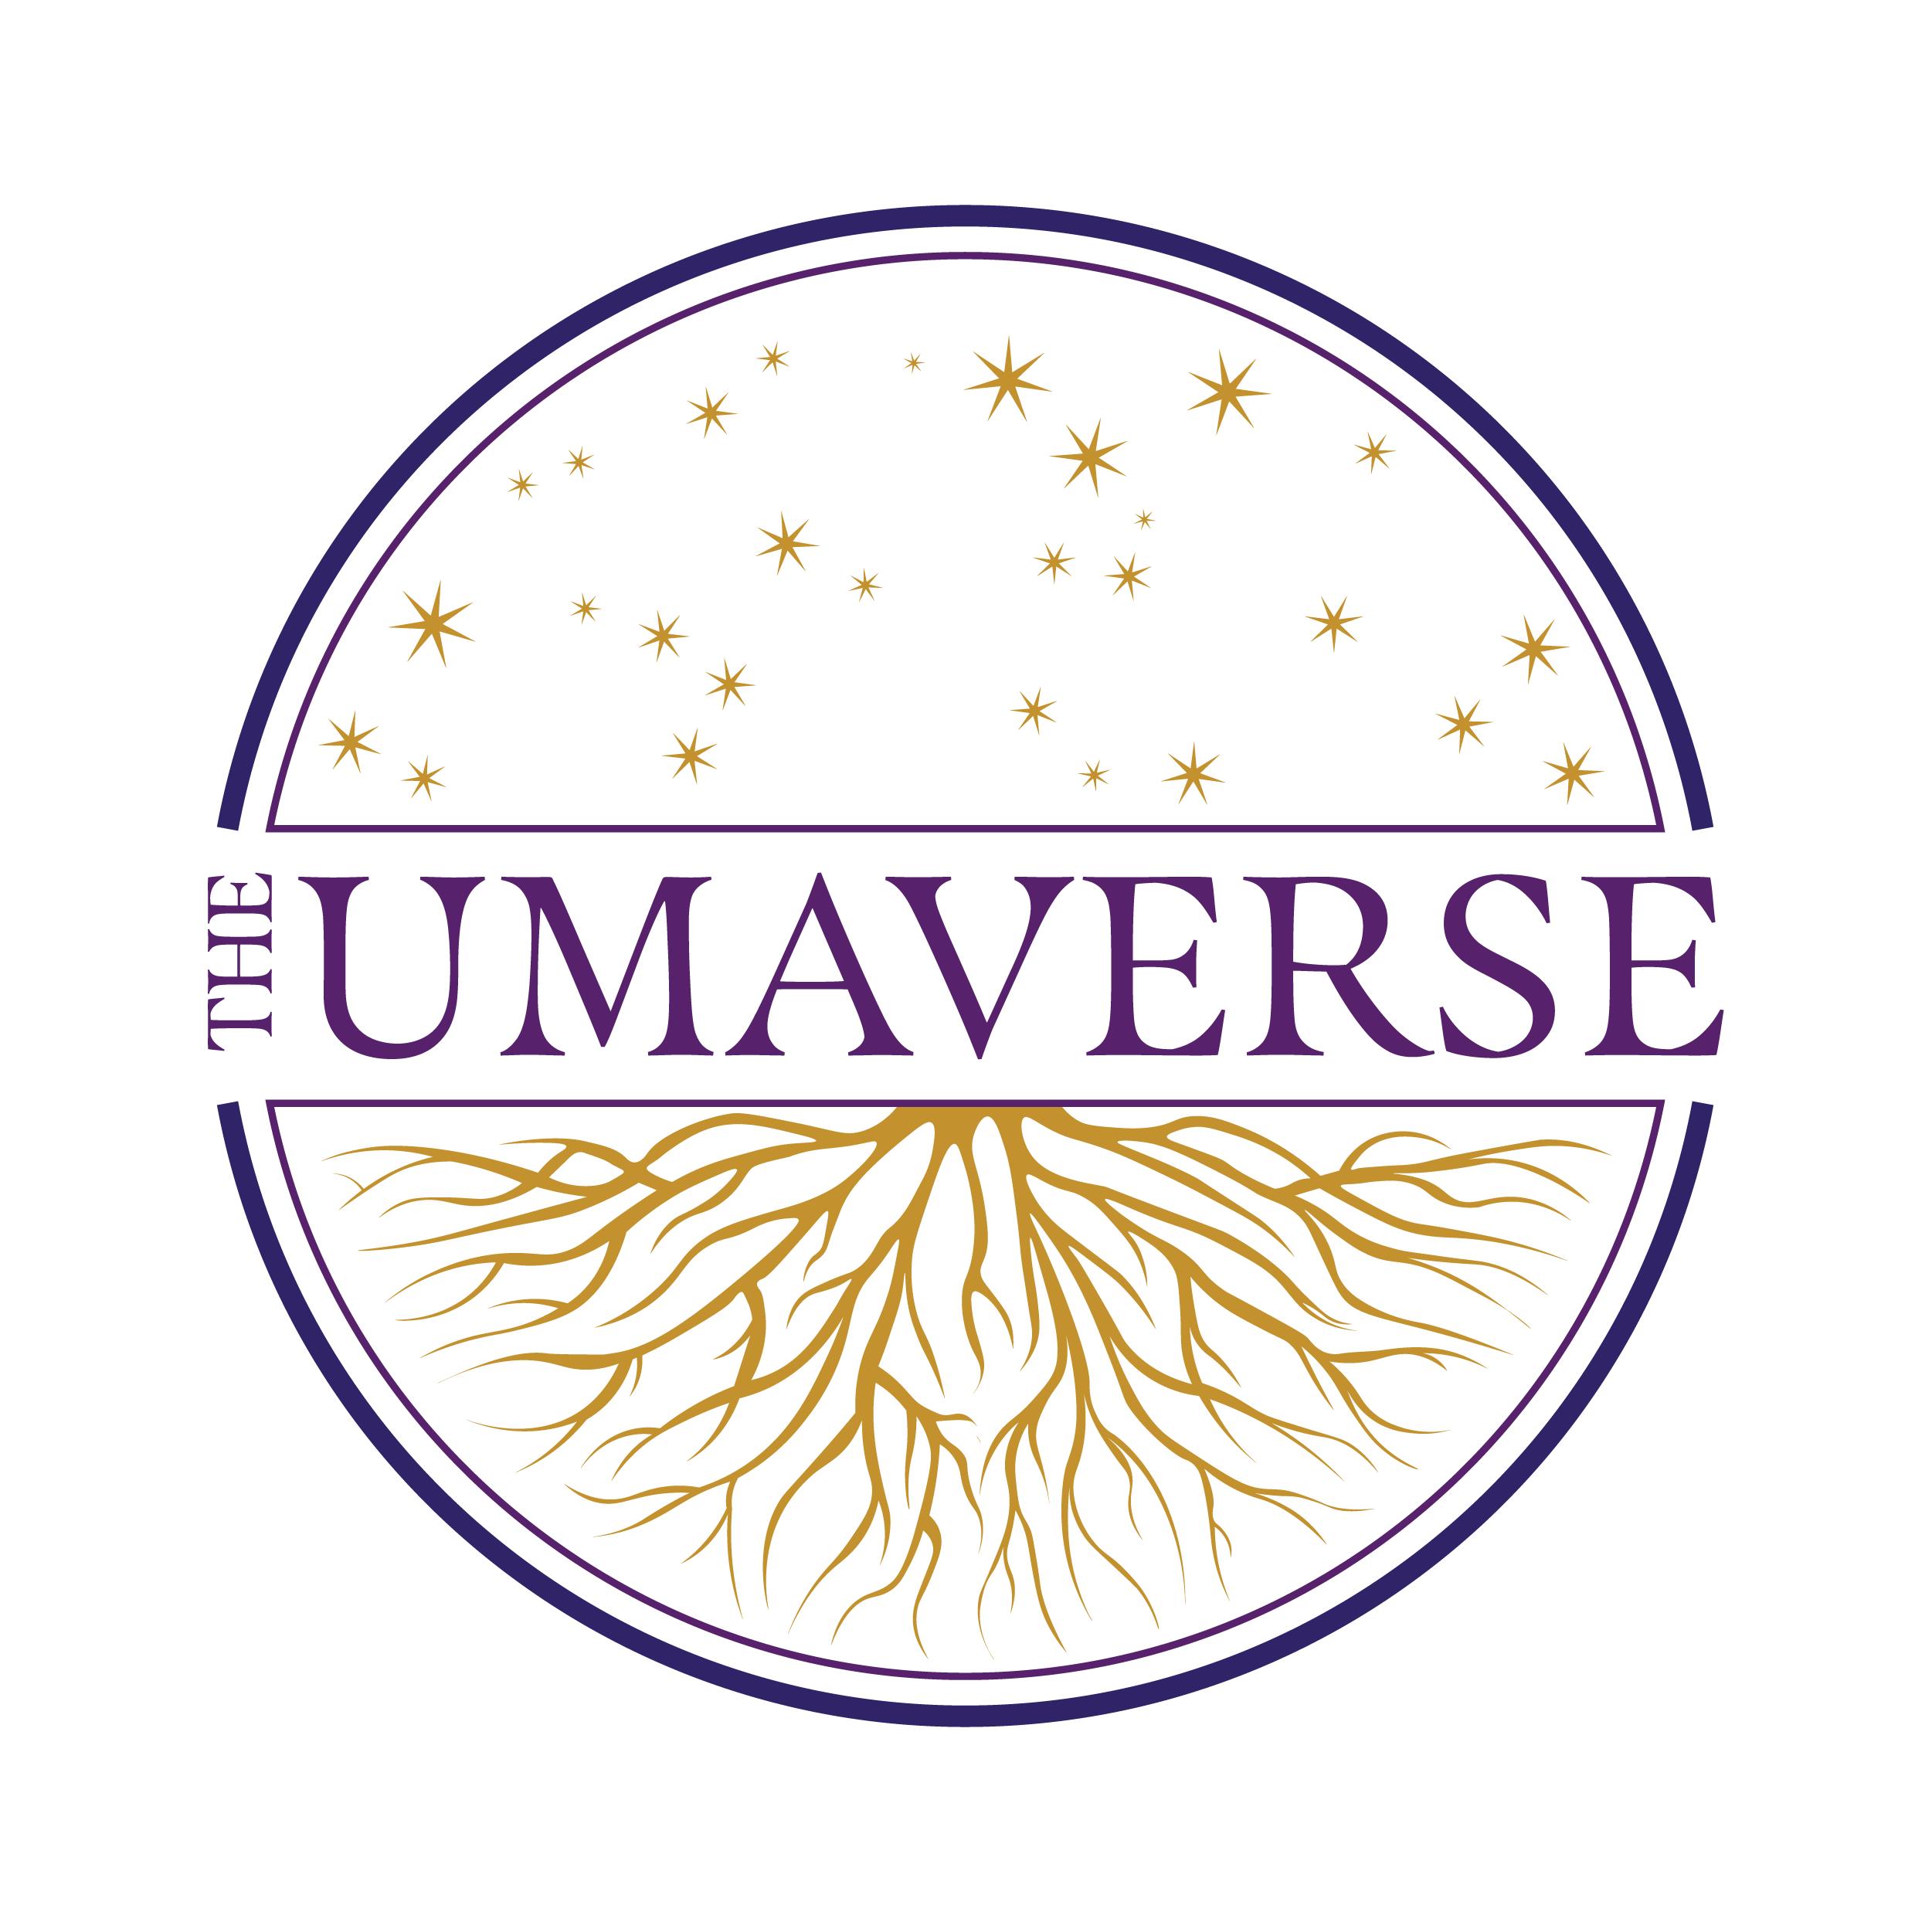 The Umaverse